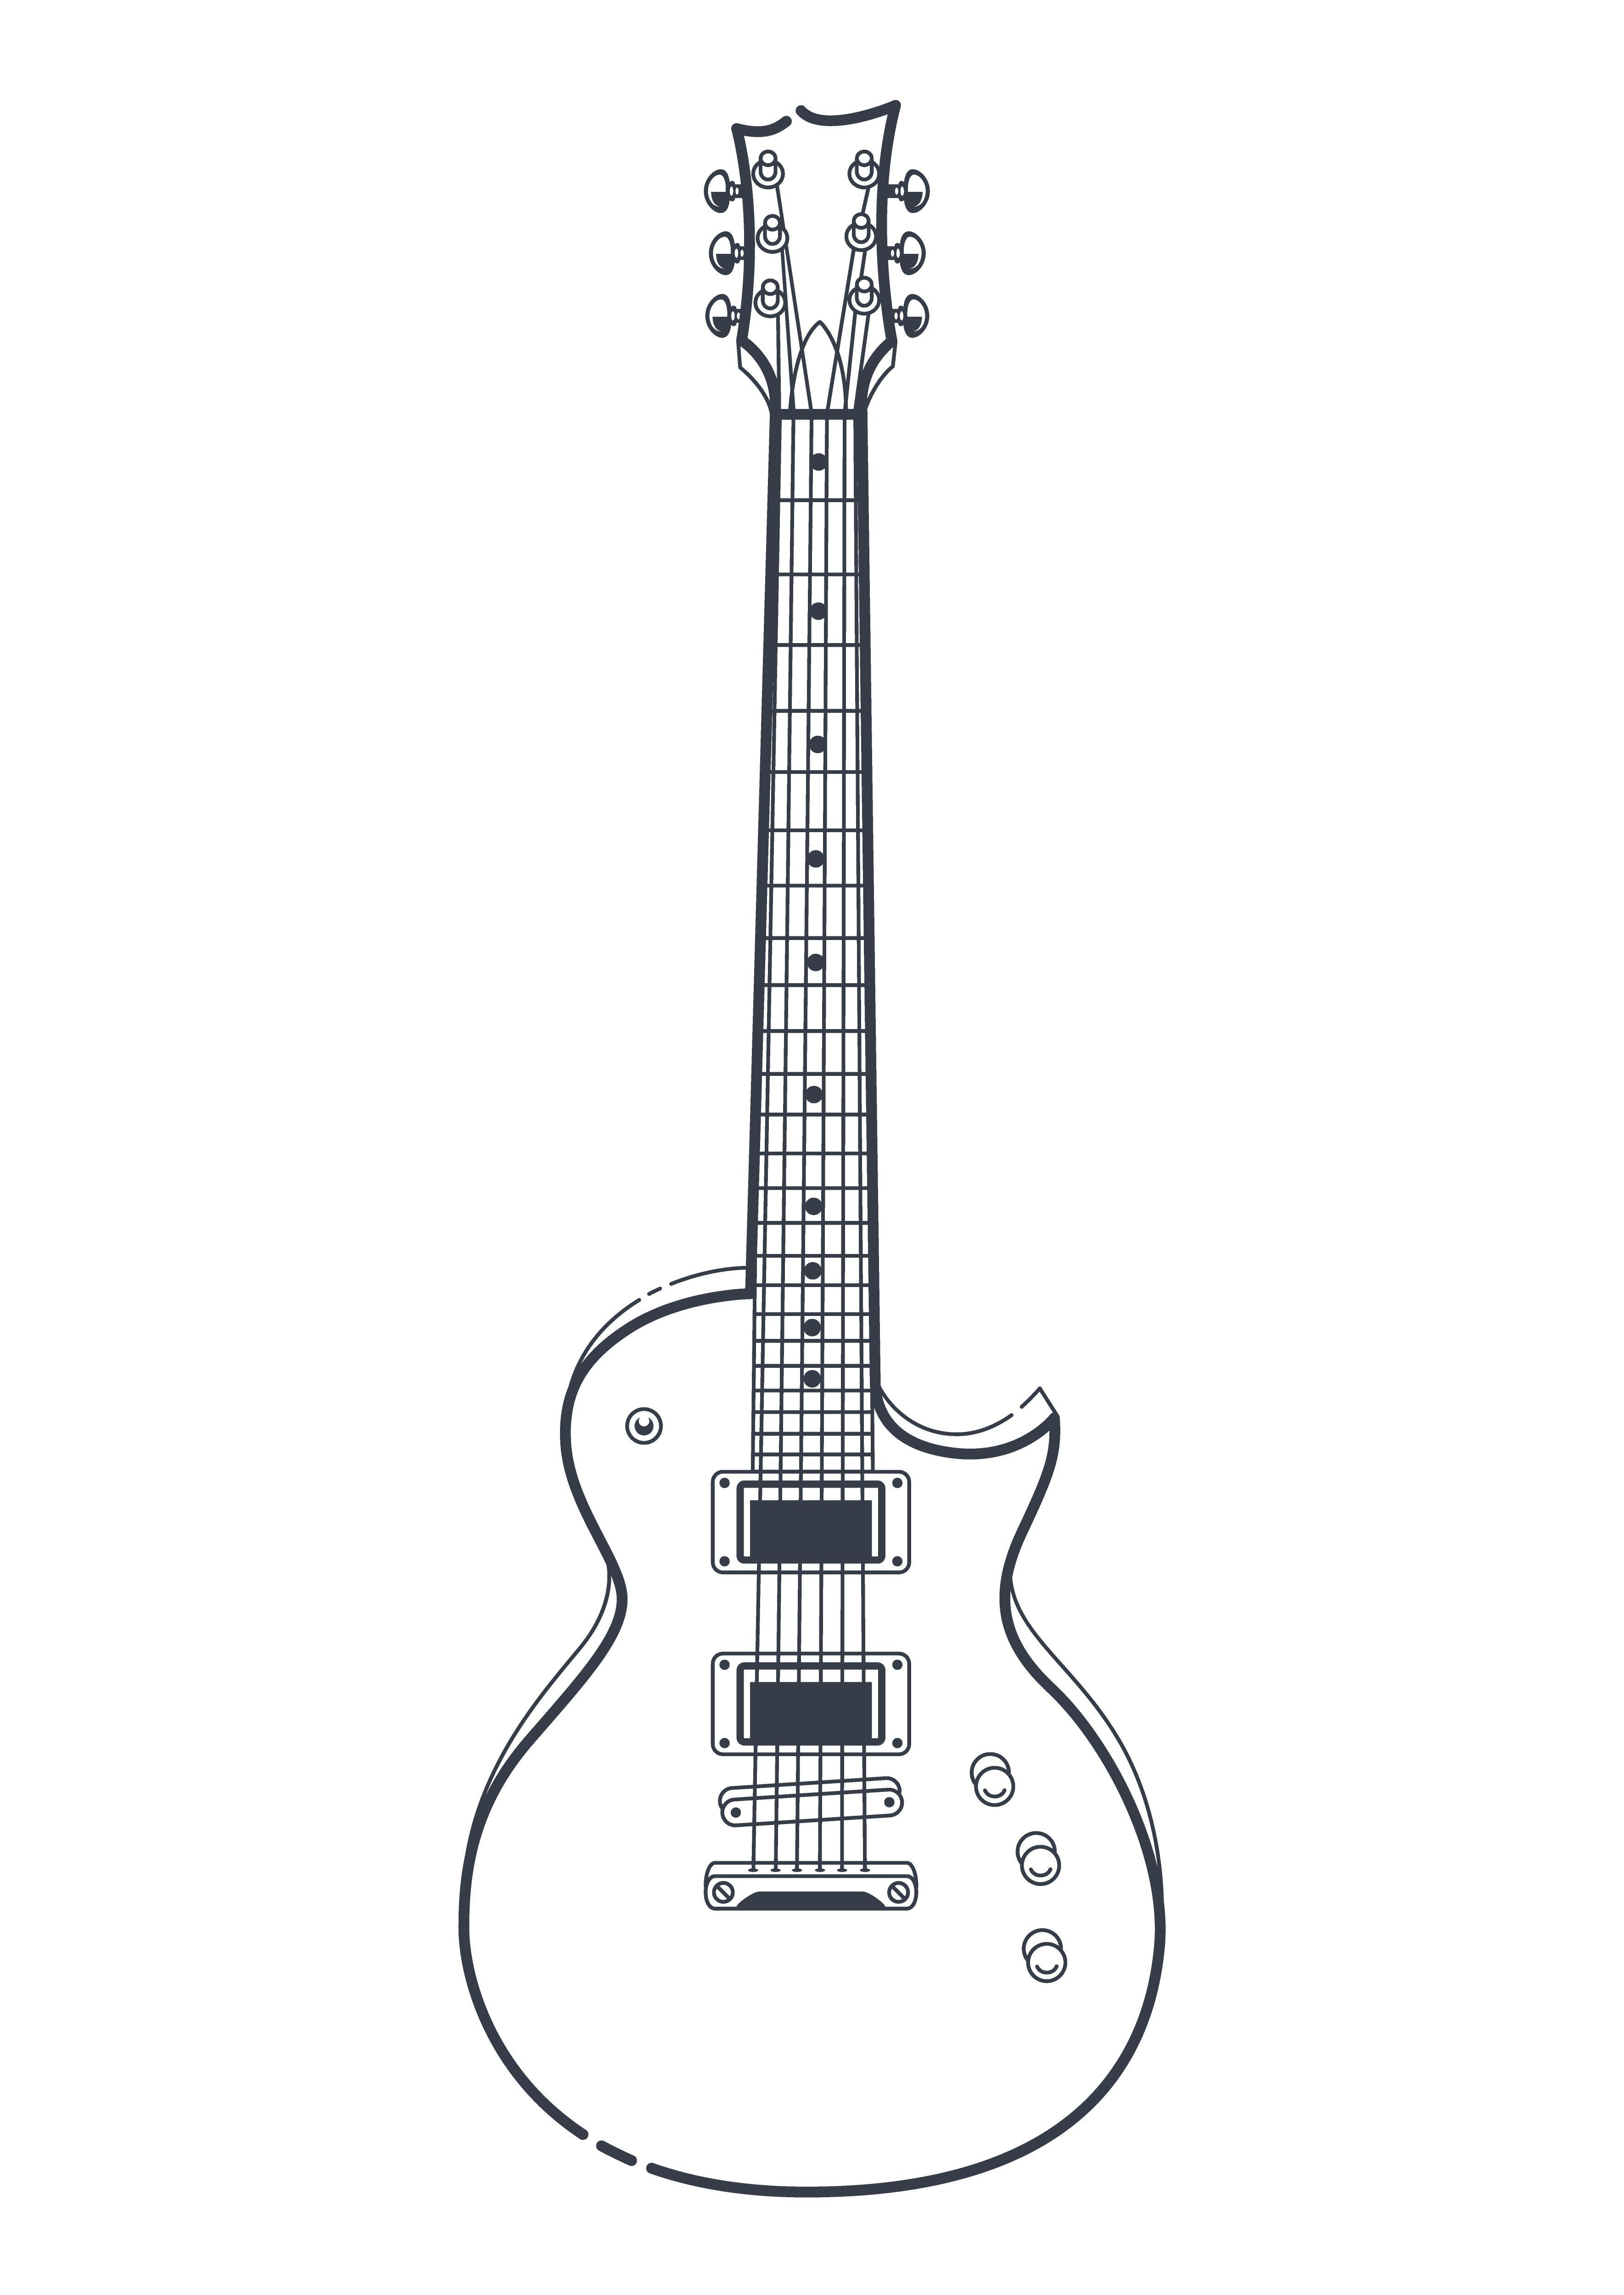 Download Electric Guitar Vector Vector Art Choose From Over A Million Free Vectors Clipart Graphics Vector Art Imag Guitar Vector Electric Guitar Art Guitar